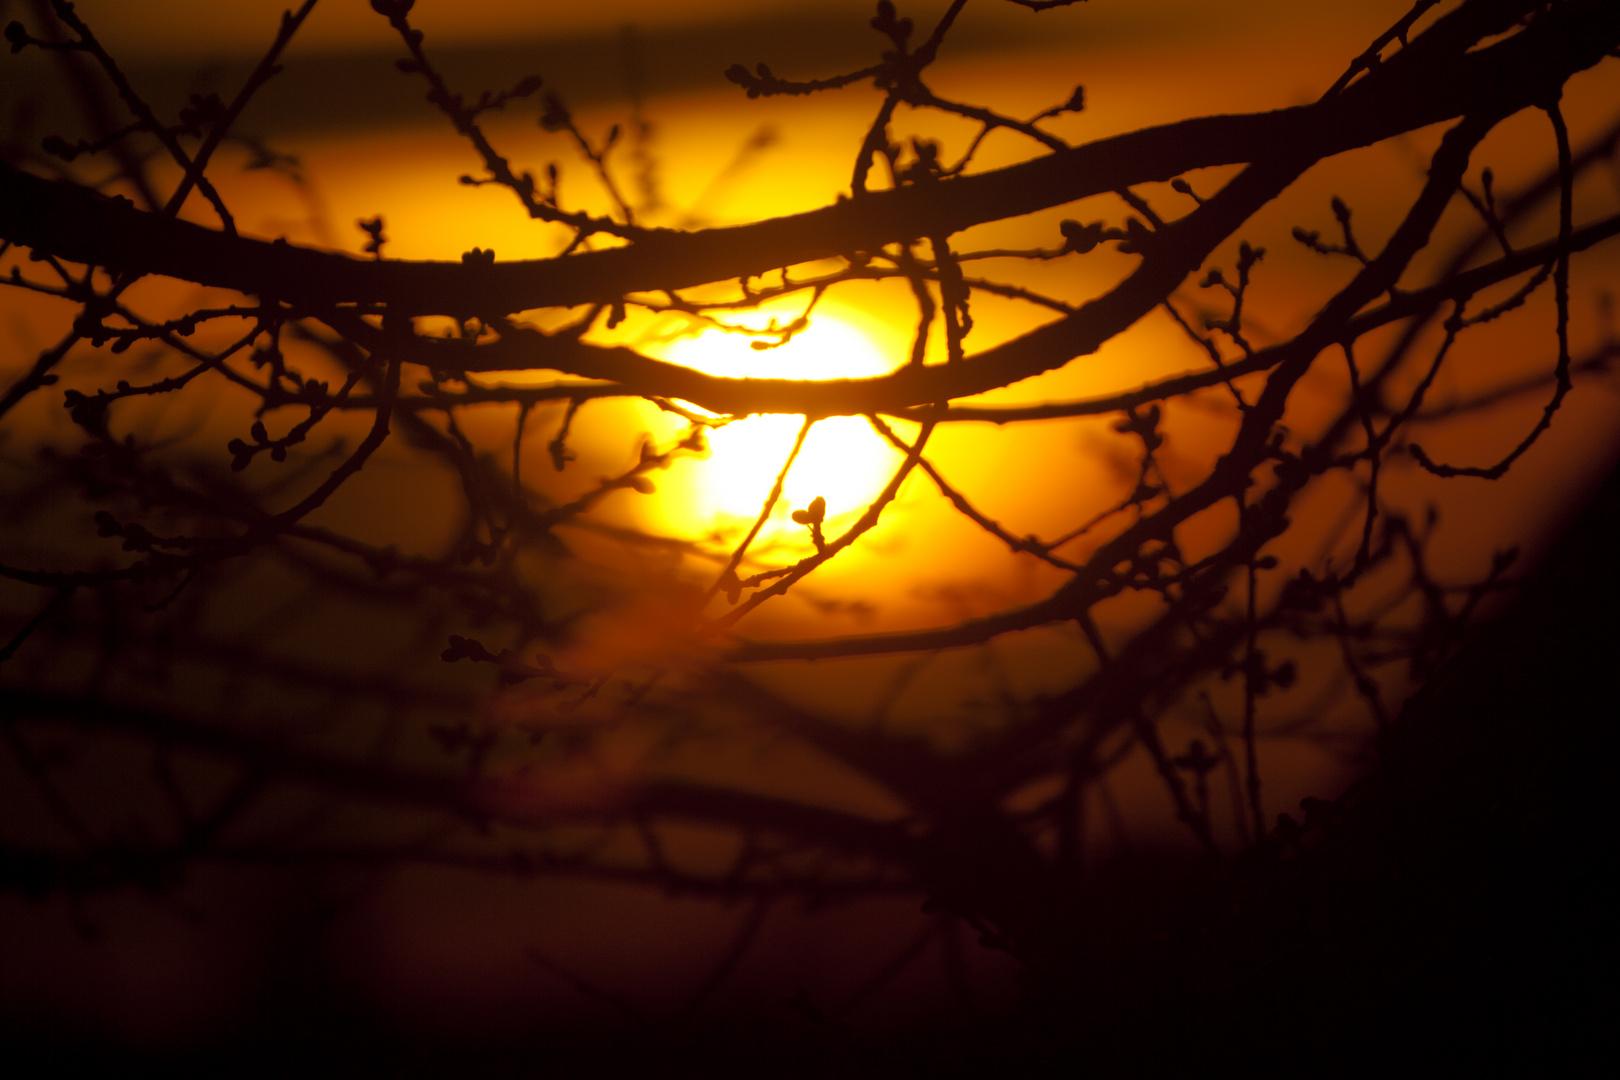 Sonnenuntergangsspiele